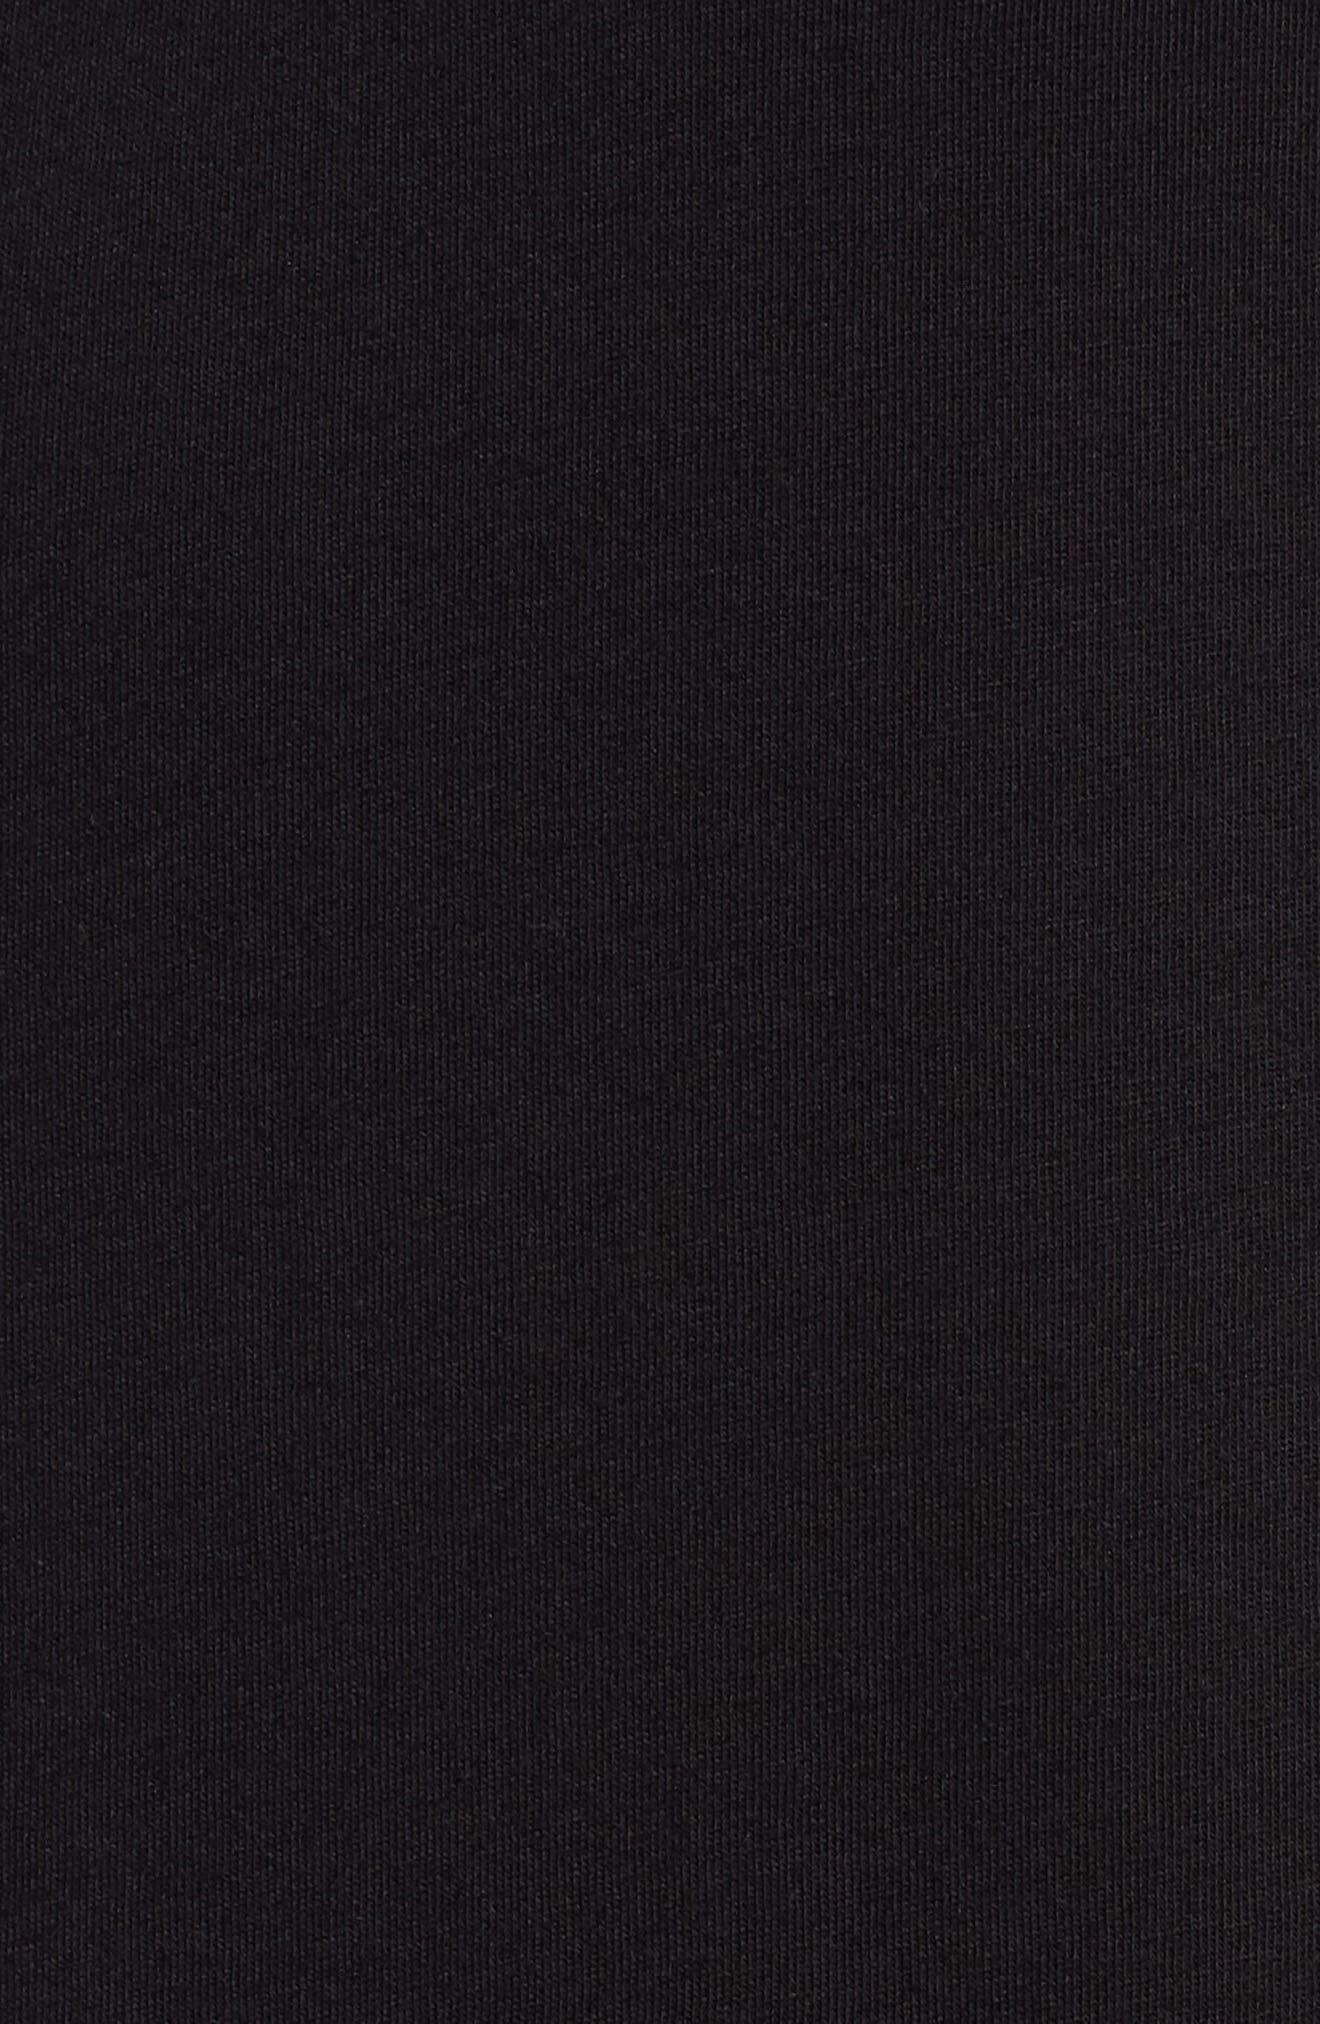 Dimage T-Shirt,                             Alternate thumbnail 5, color,                             Black